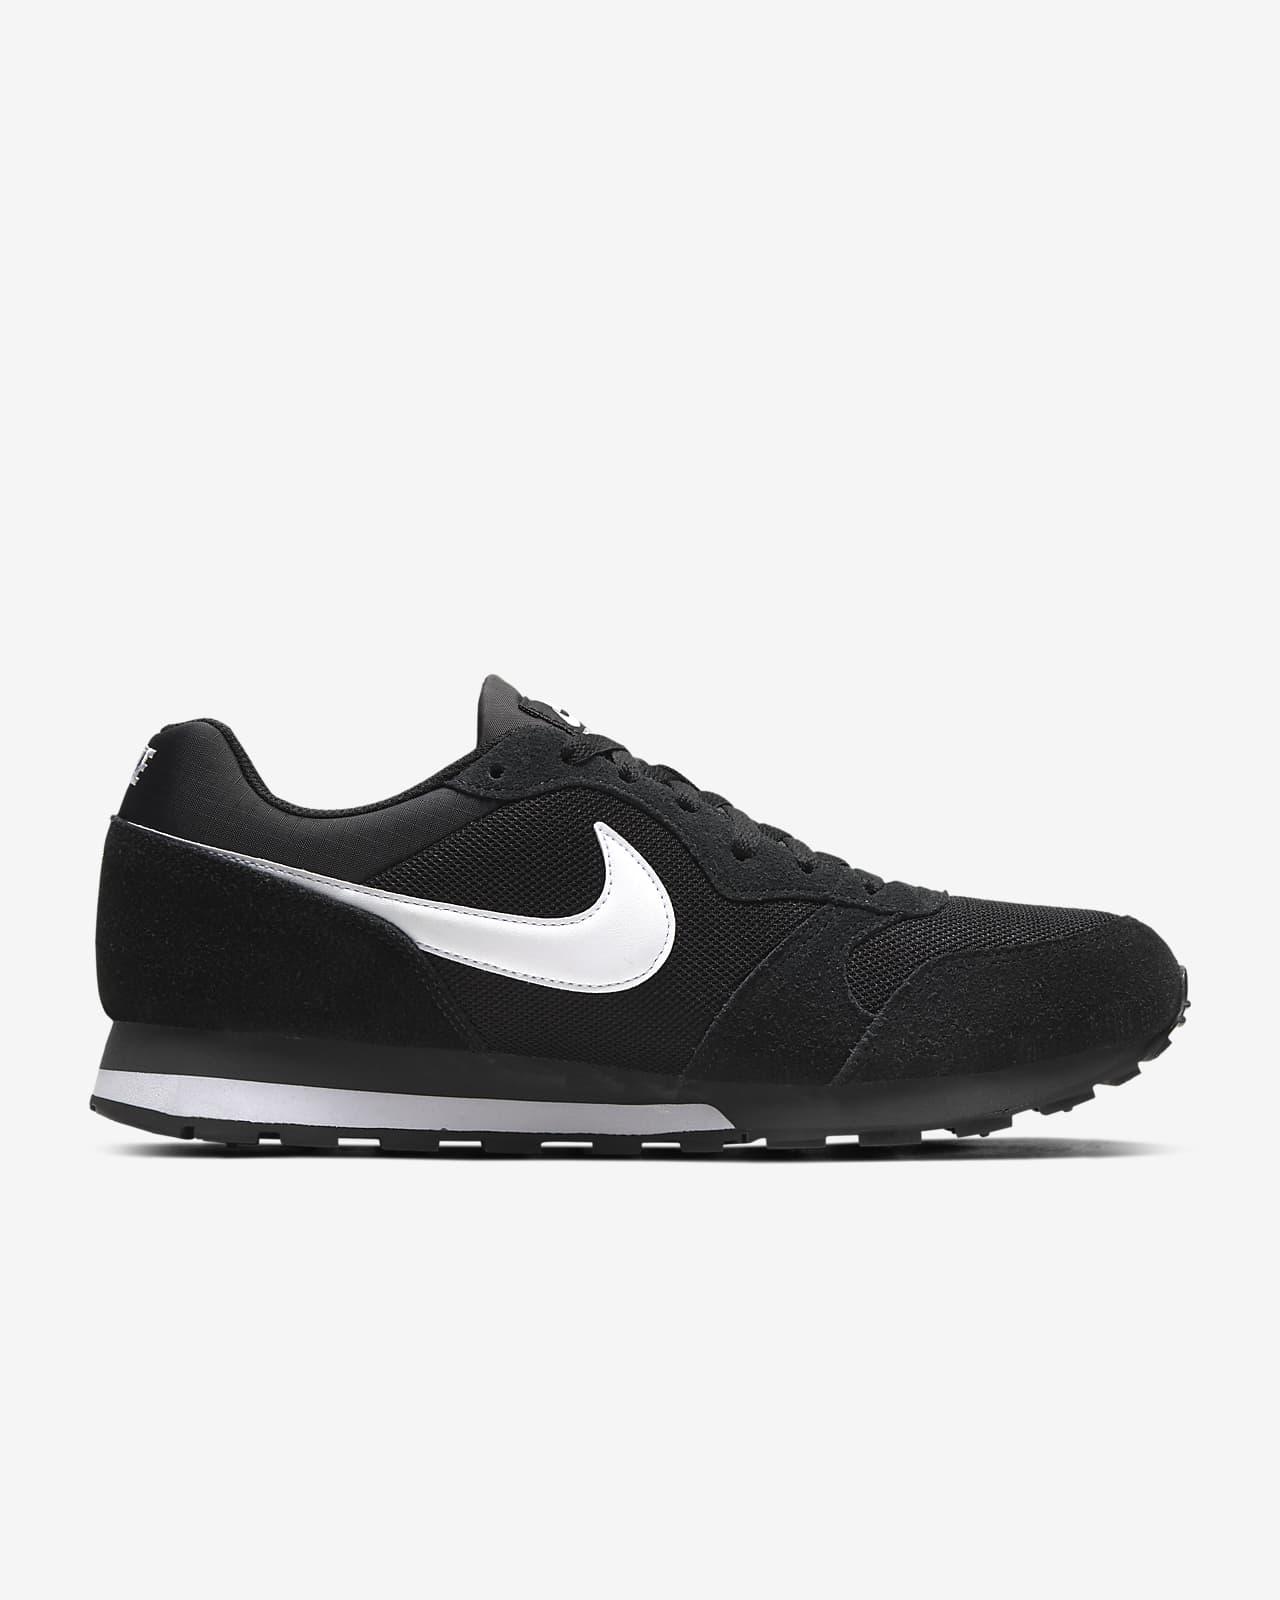 Nike Md Runner 2 45 77 Korting Www Amazinggrapes Nl